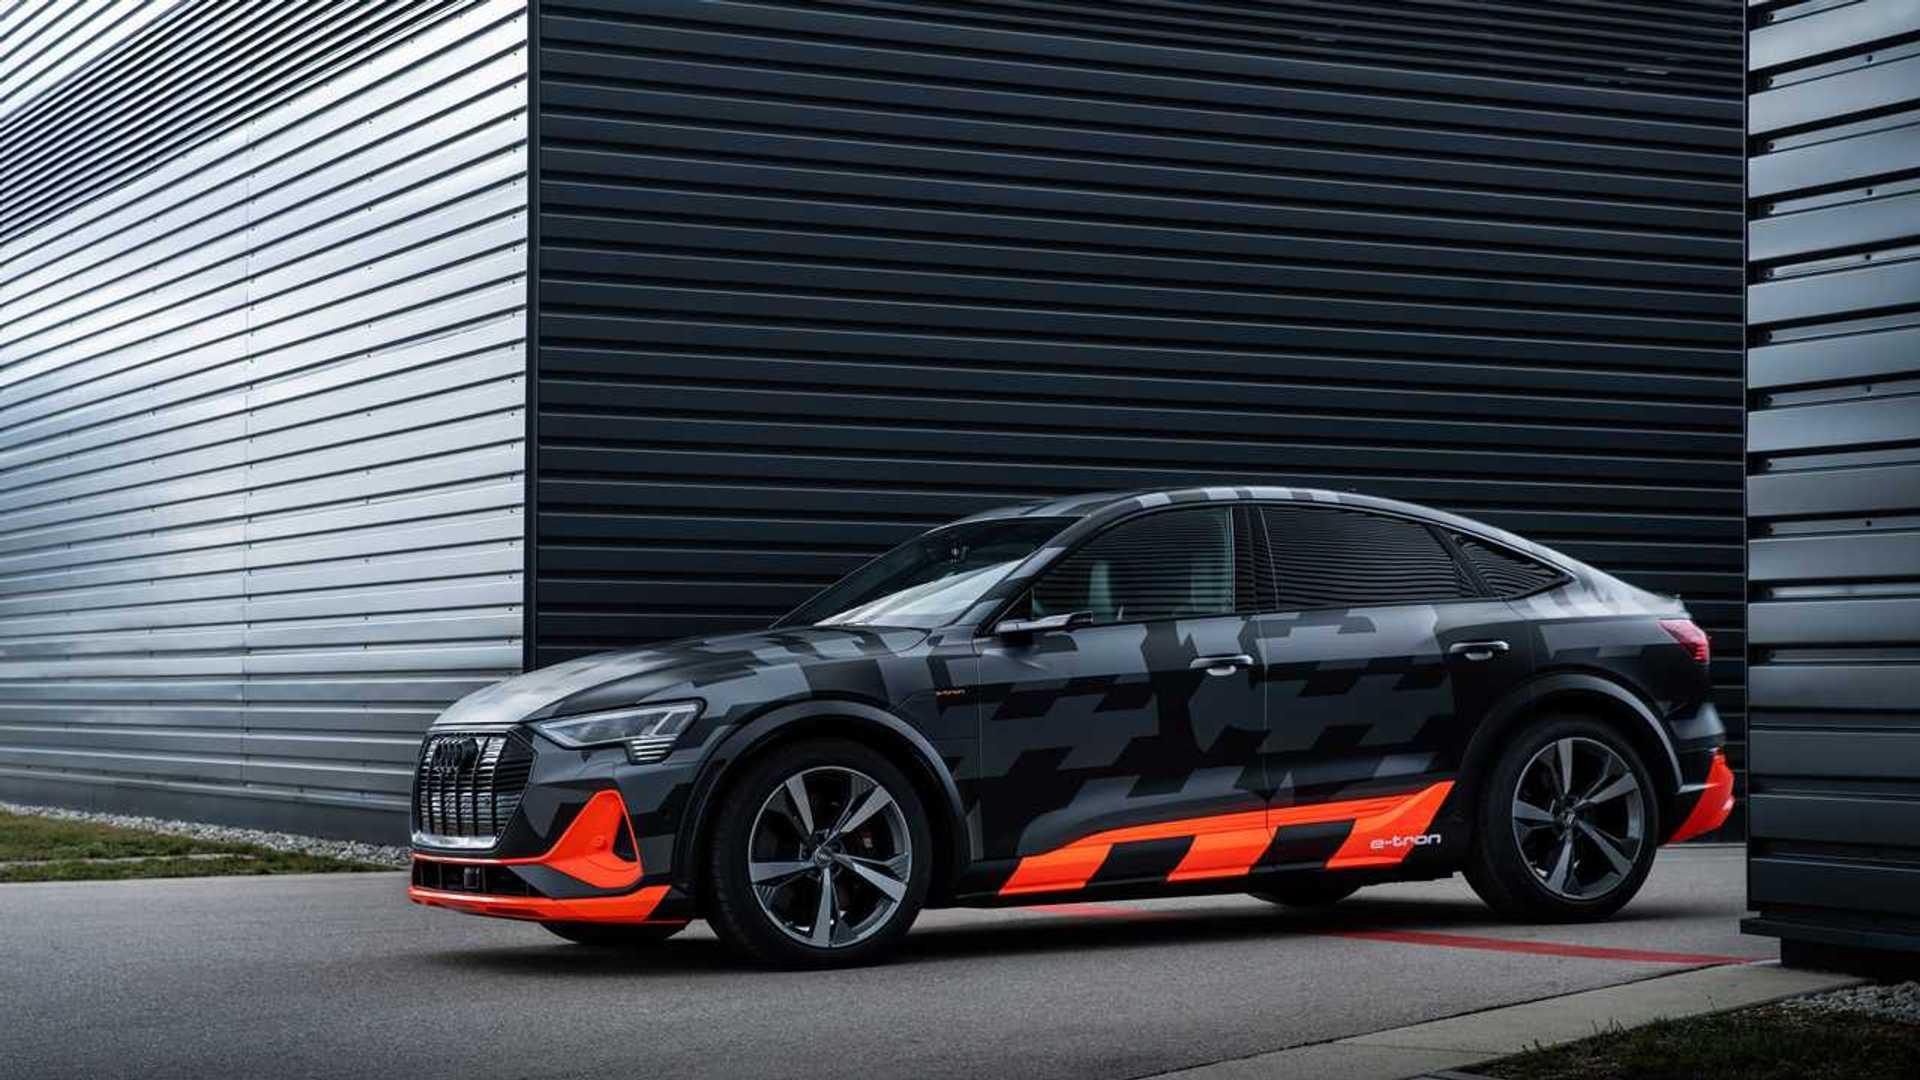 2020 - [Audi] E-Tron Sportback - Page 3 2020-audi-e-tron-s-exclusive